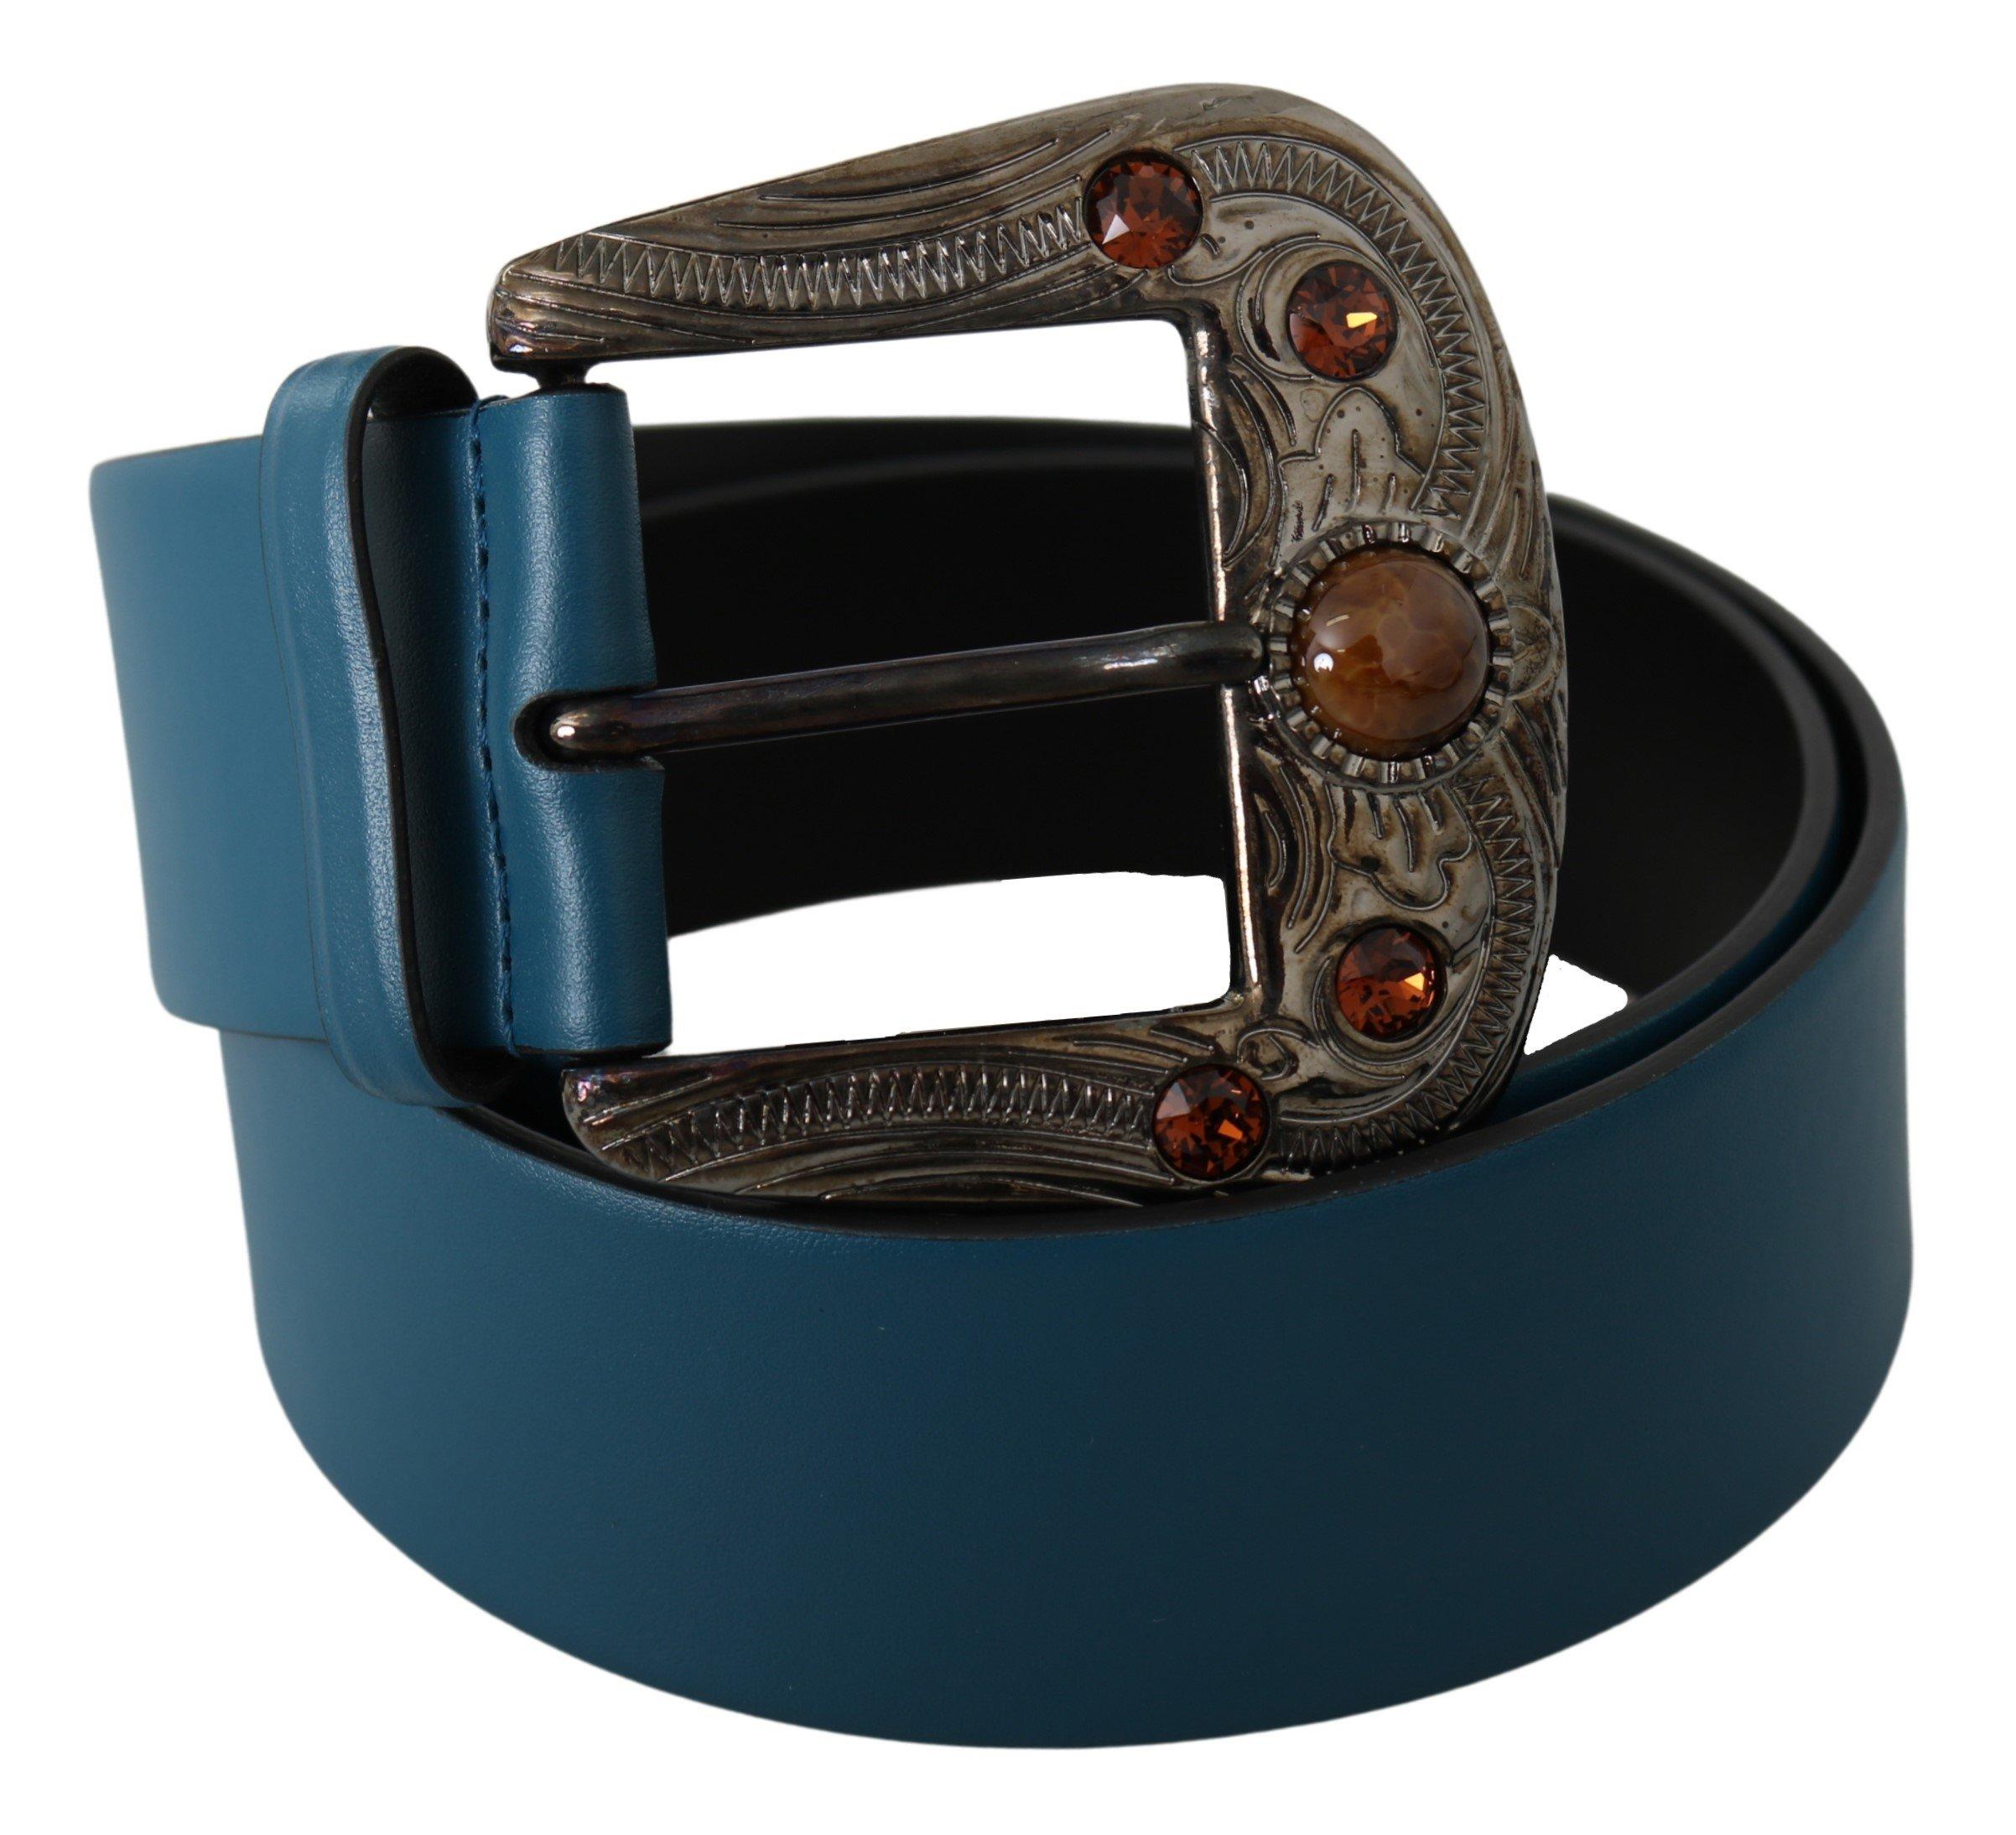 Blue Leather Orange Crystal Baroque Buckle Belt - 90 cm / 36 Inches